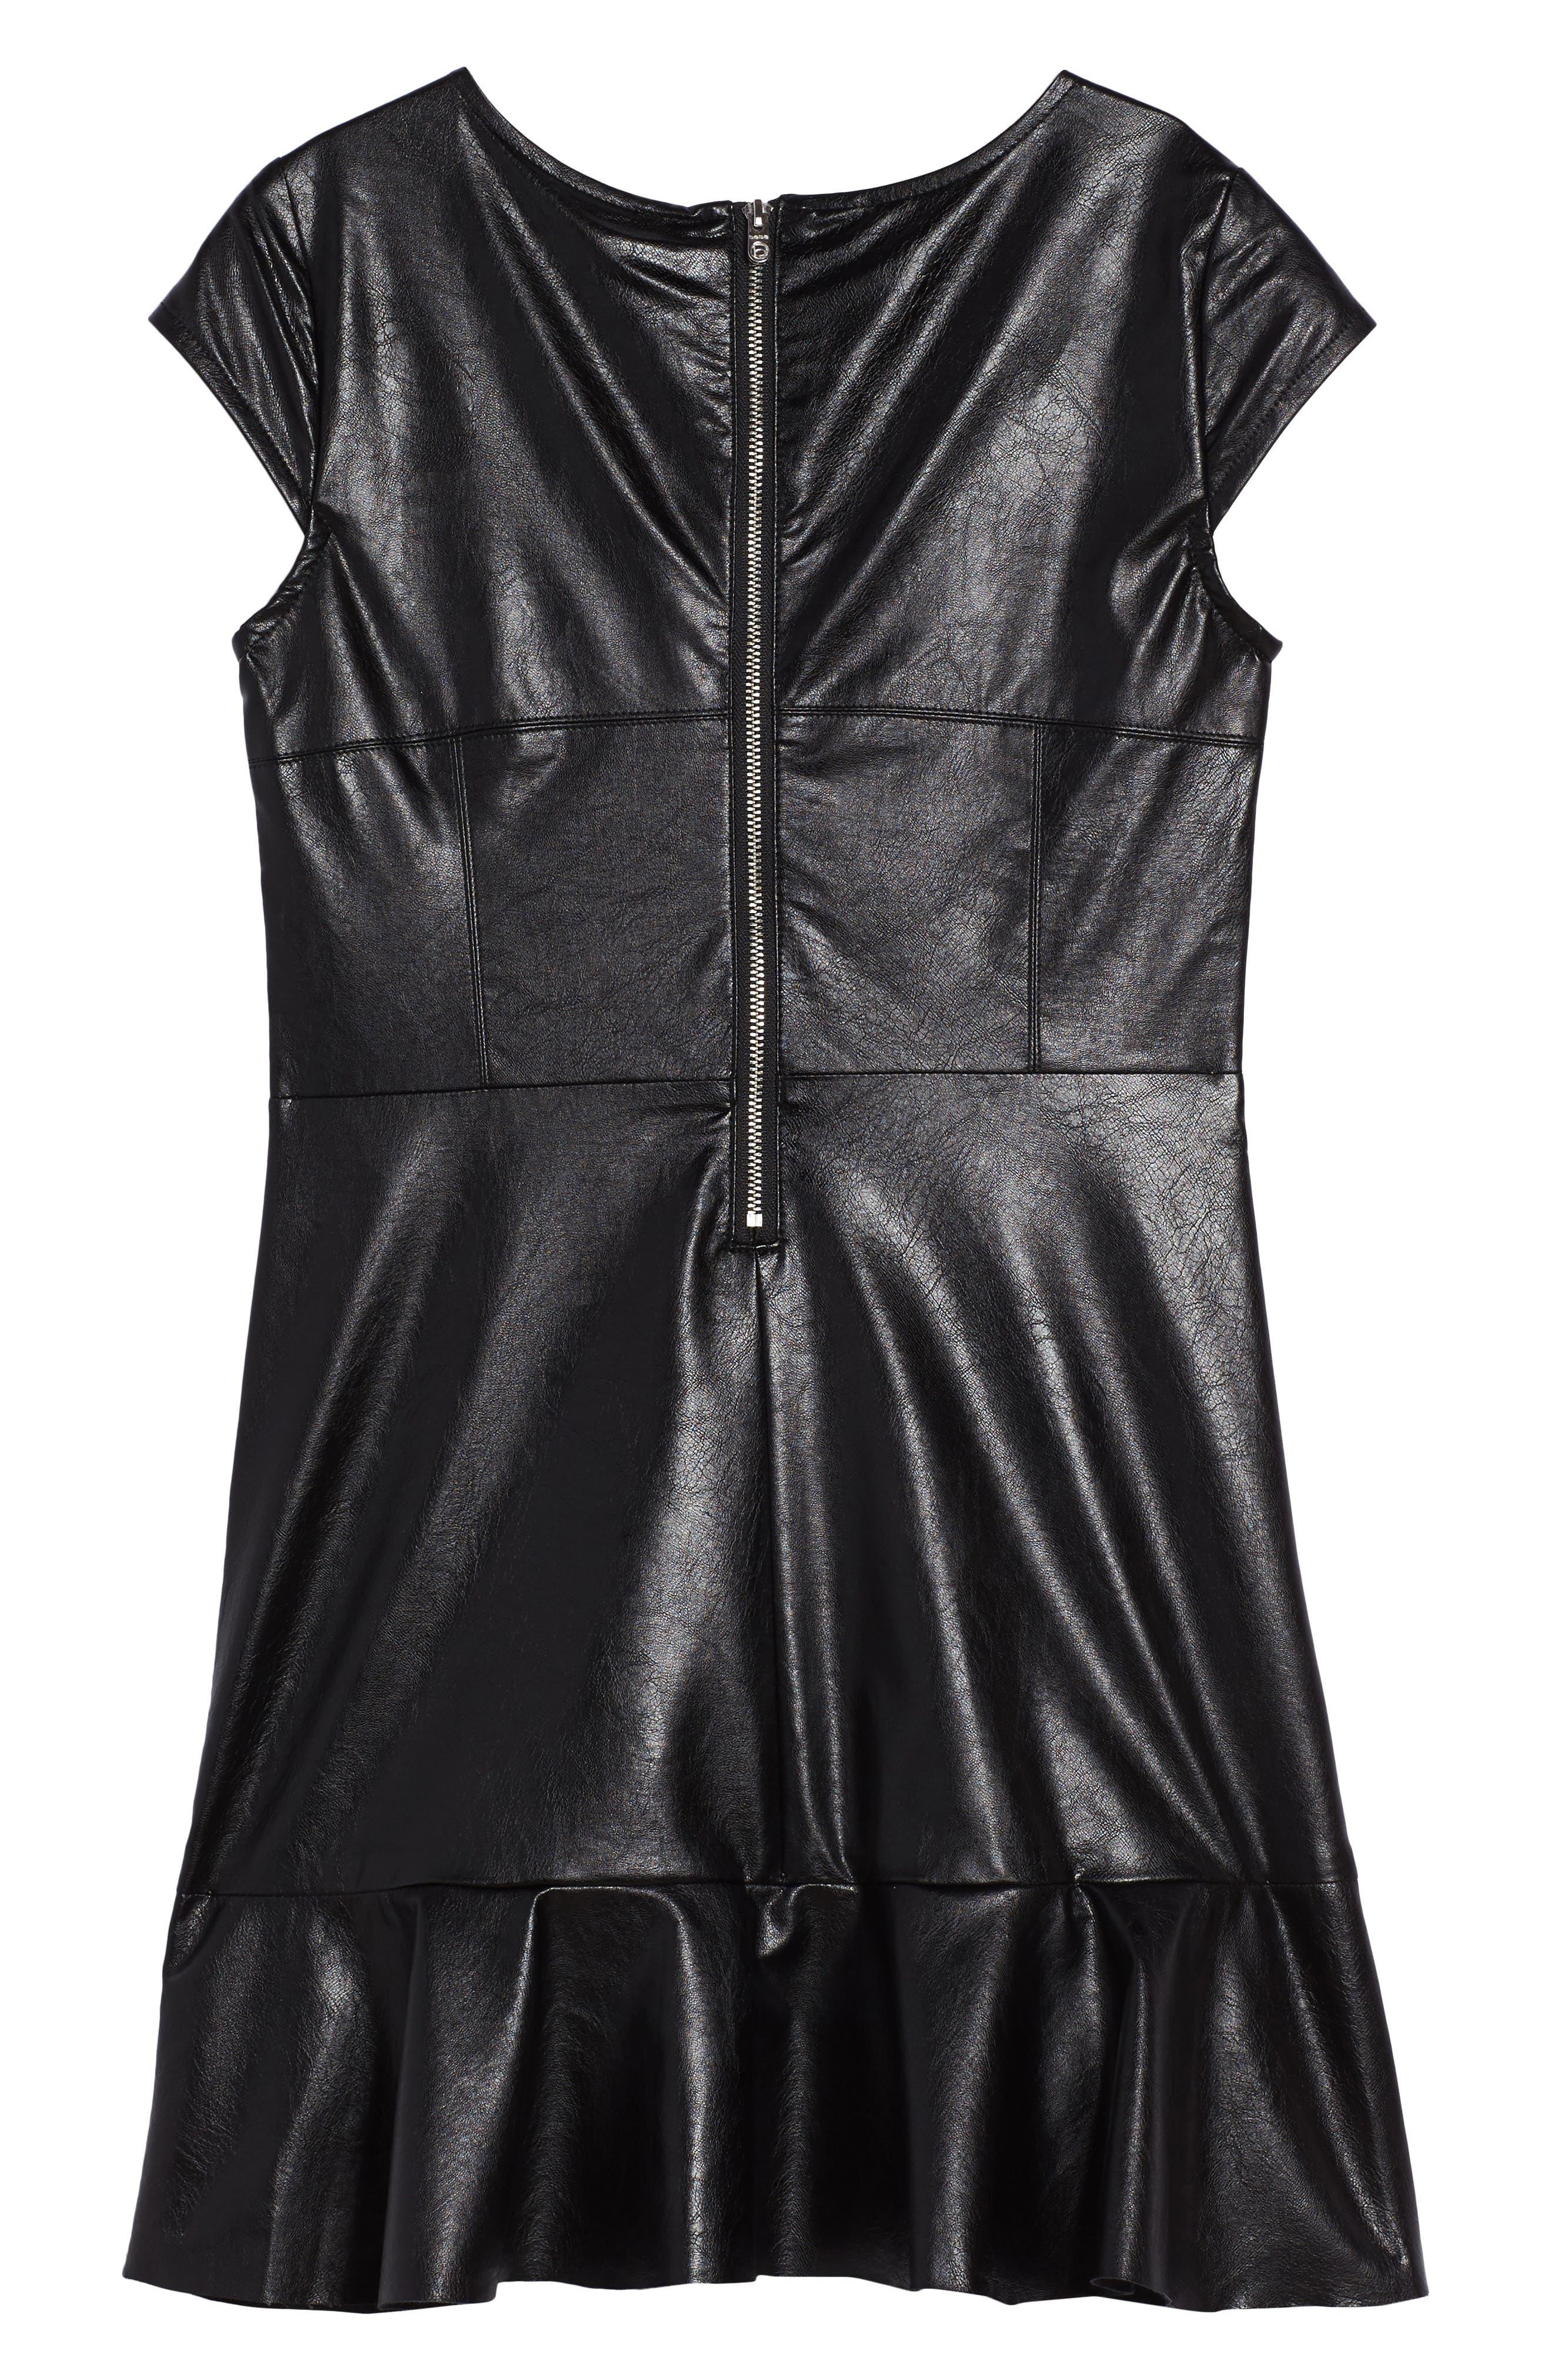 Alternate Image 2  - bebe Embroidered Faux Leather Dress (Big Girls)